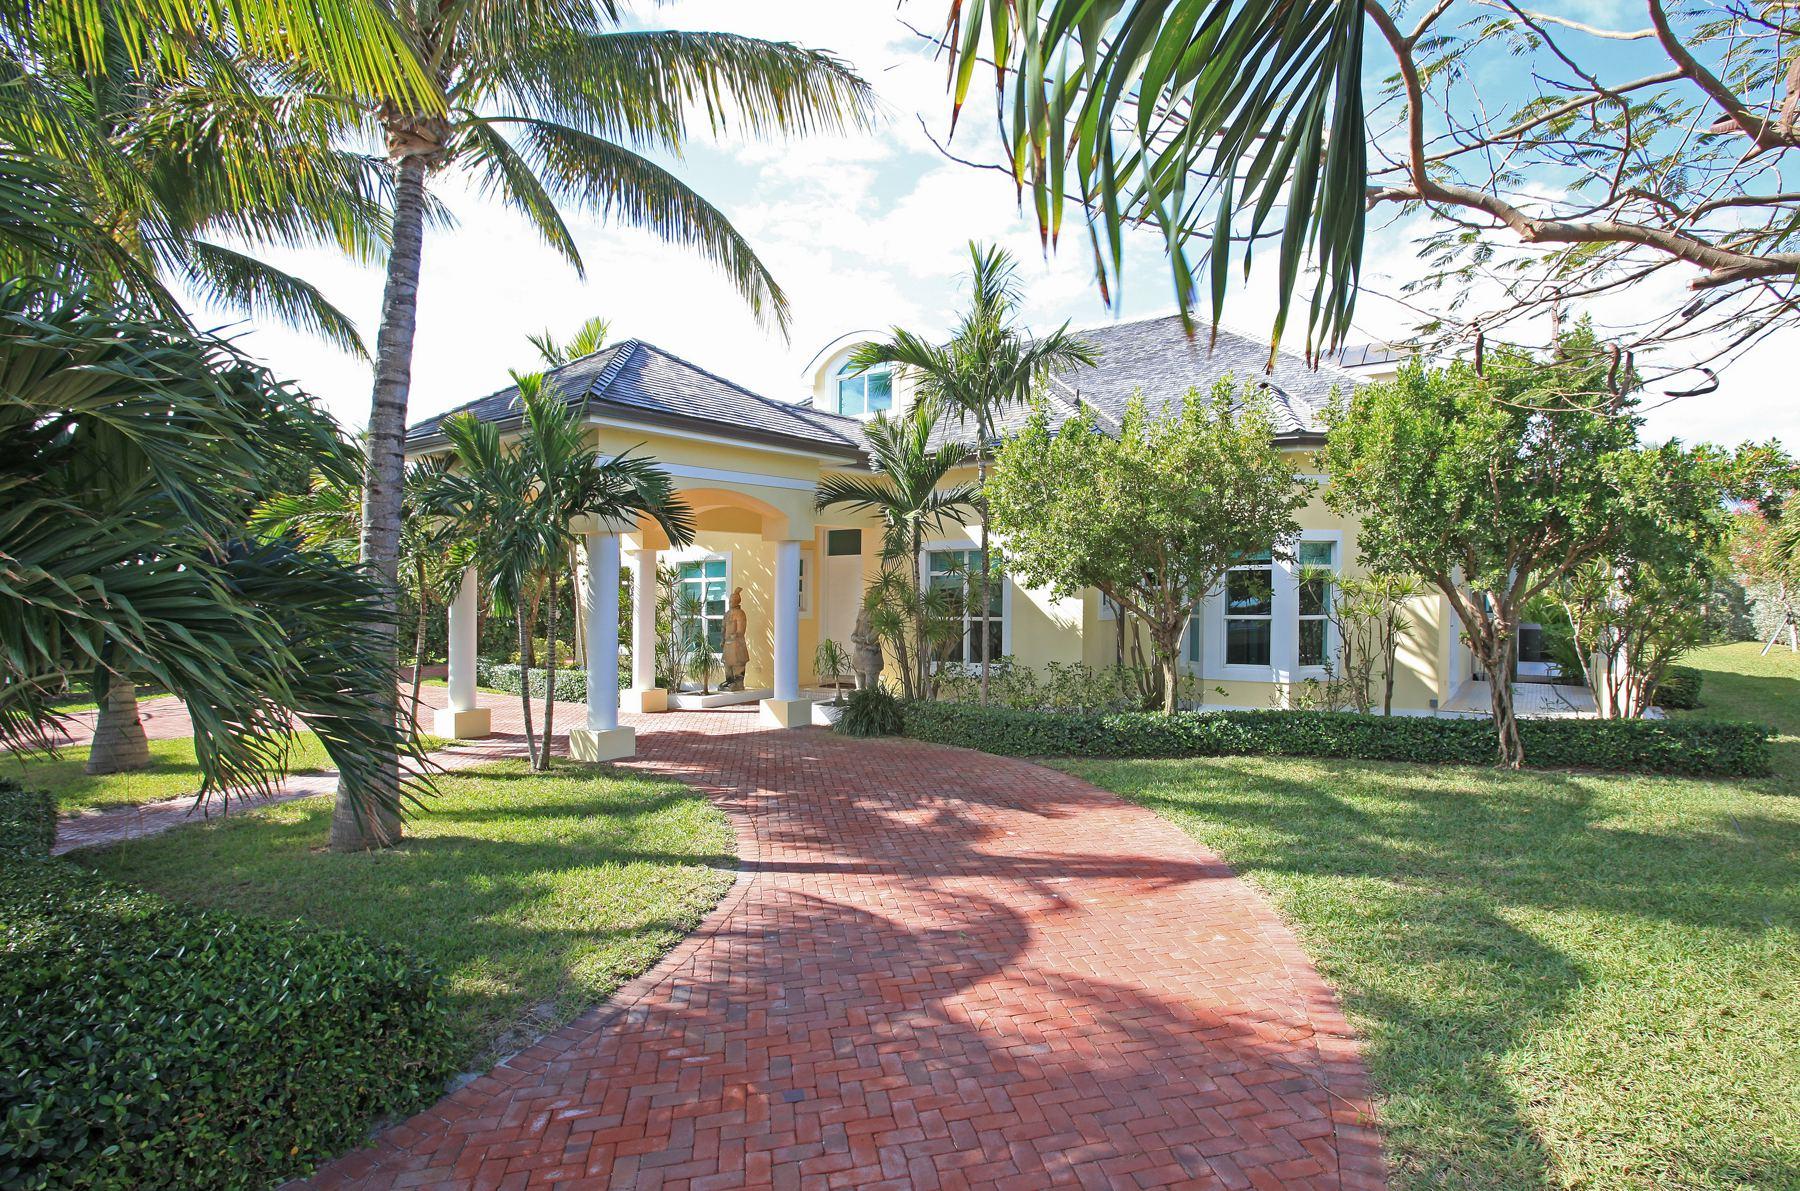 Single Family Home for Rent at Ocean Club Estates #22 Ocean Club Estates, Paradise Island, Nassau And Paradise Island Bahamas